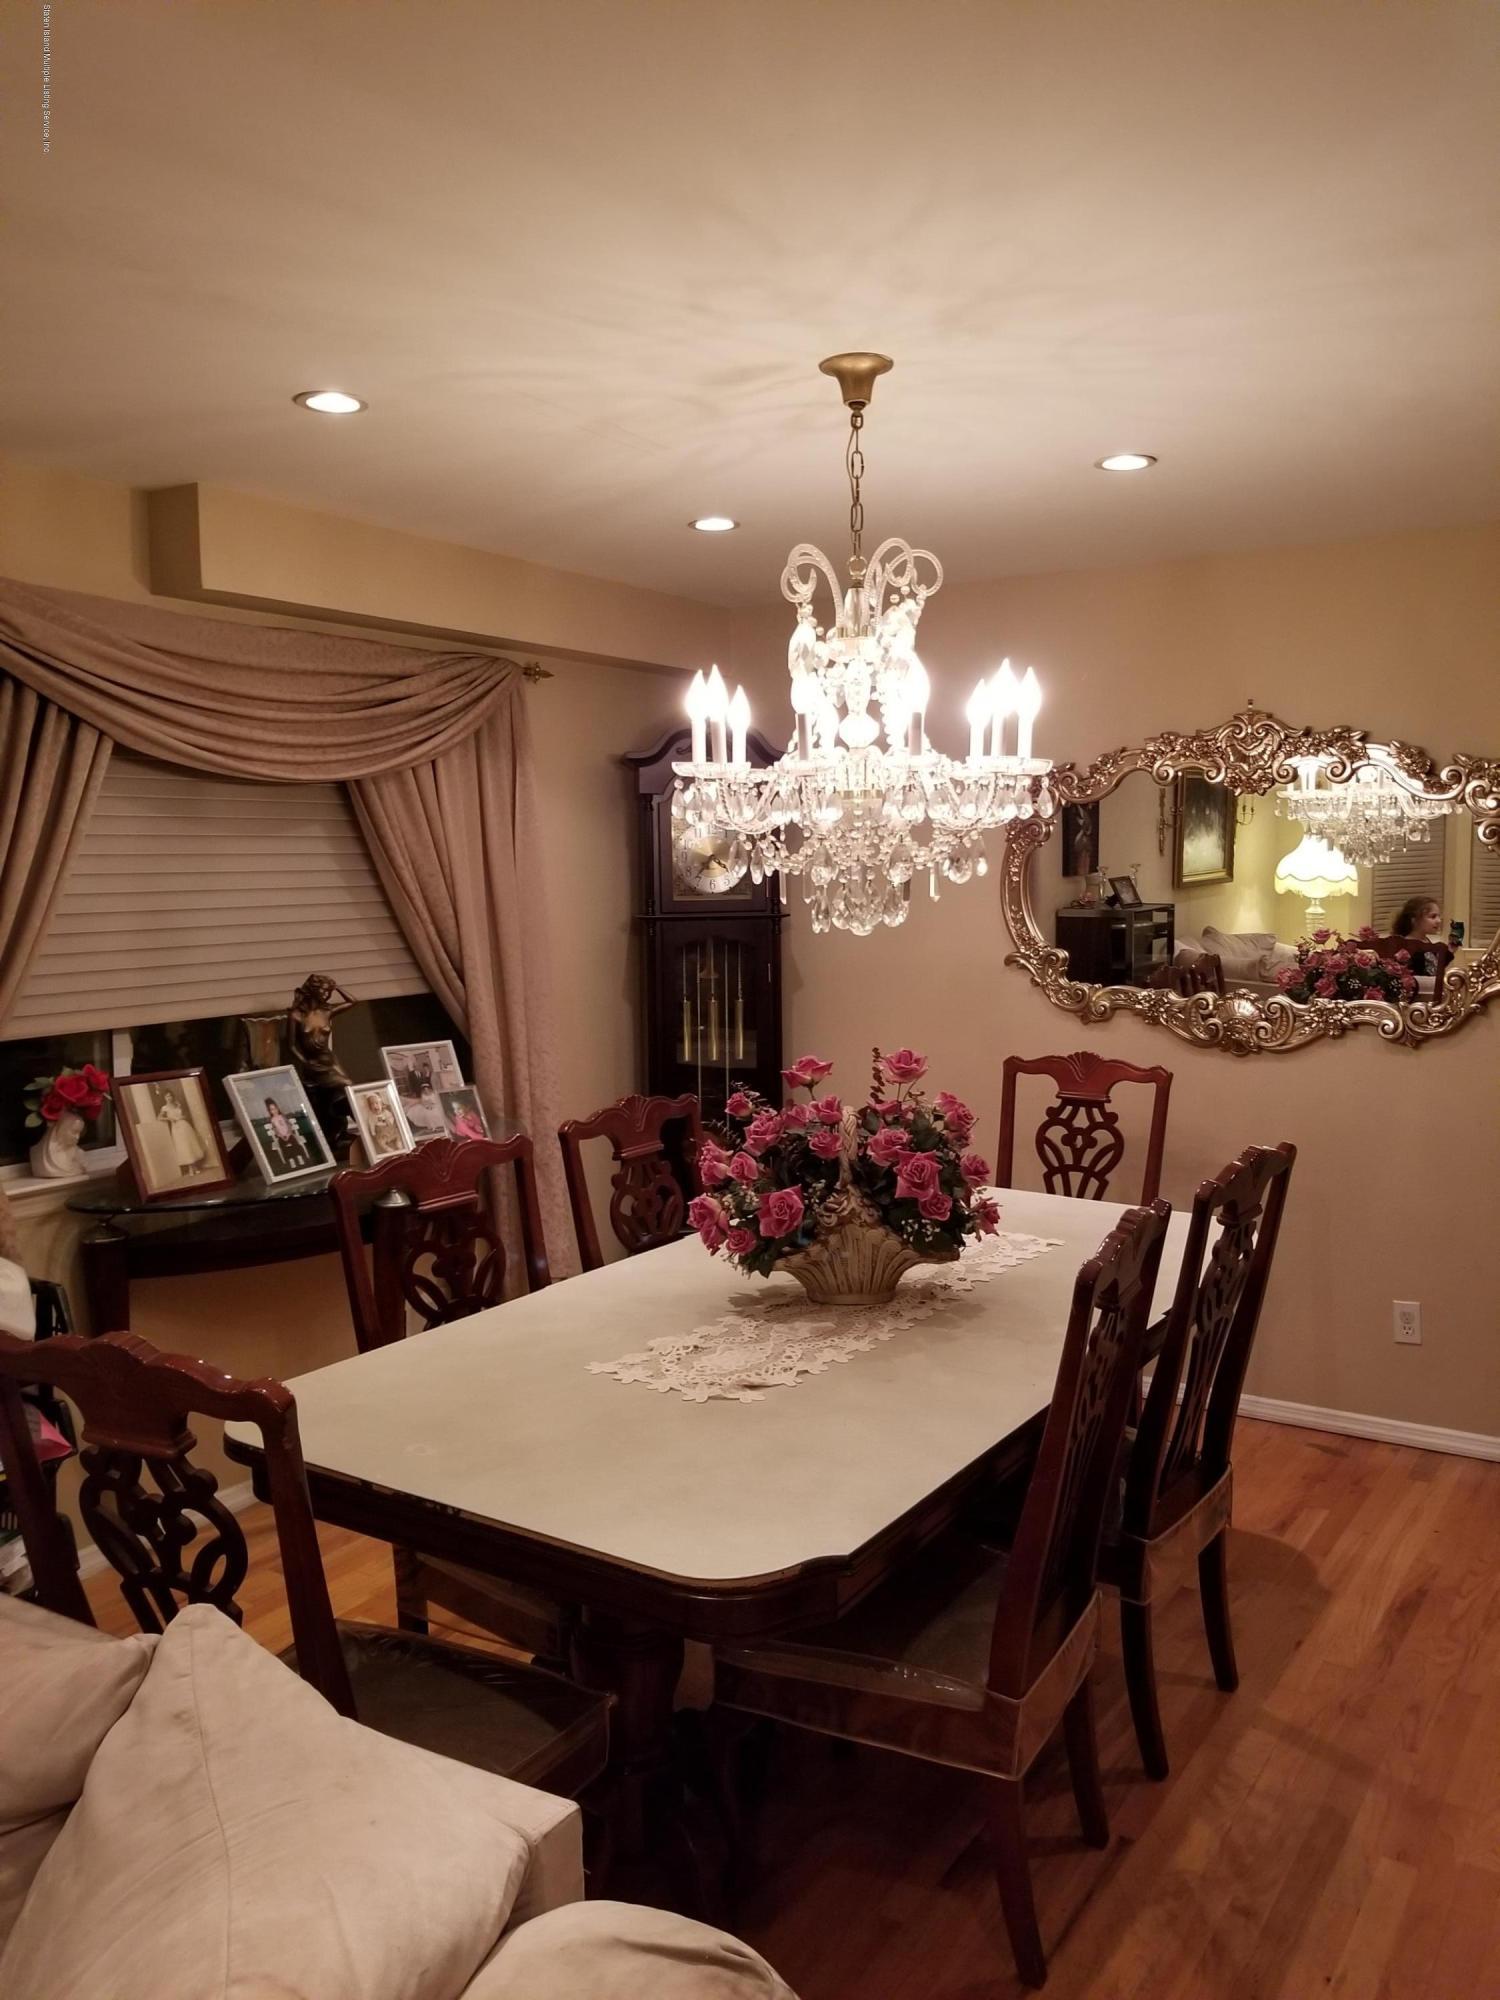 Single Family - Detached 92 Meagan Loop  Staten Island, NY 10307, MLS-1123137-14